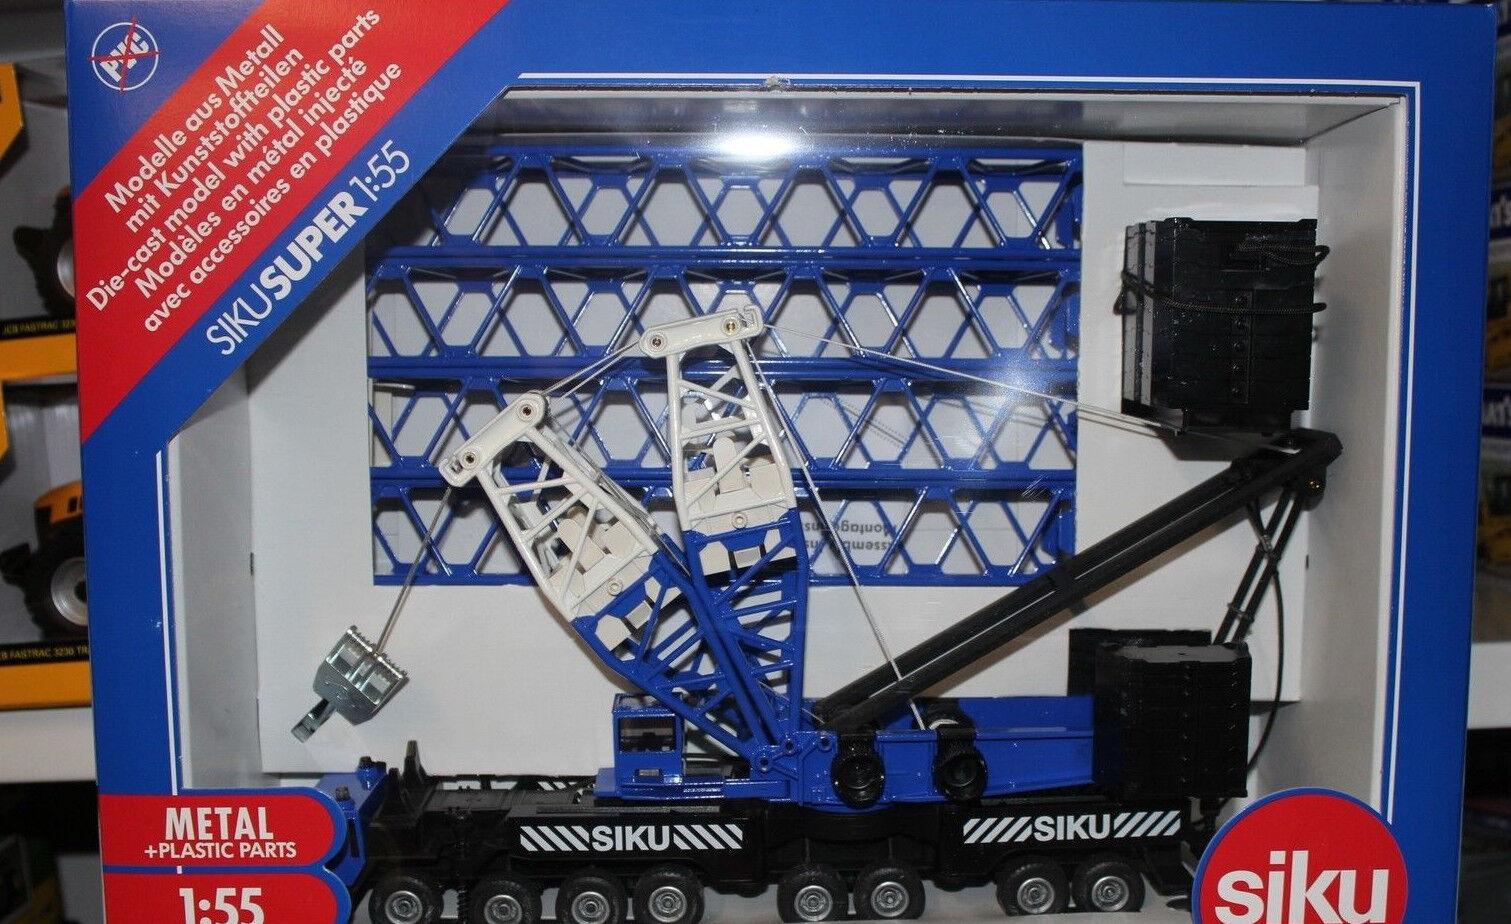 Siku 4810 Gru Mobile Pesante 1 55 Nuovo in Confezione Originale blue